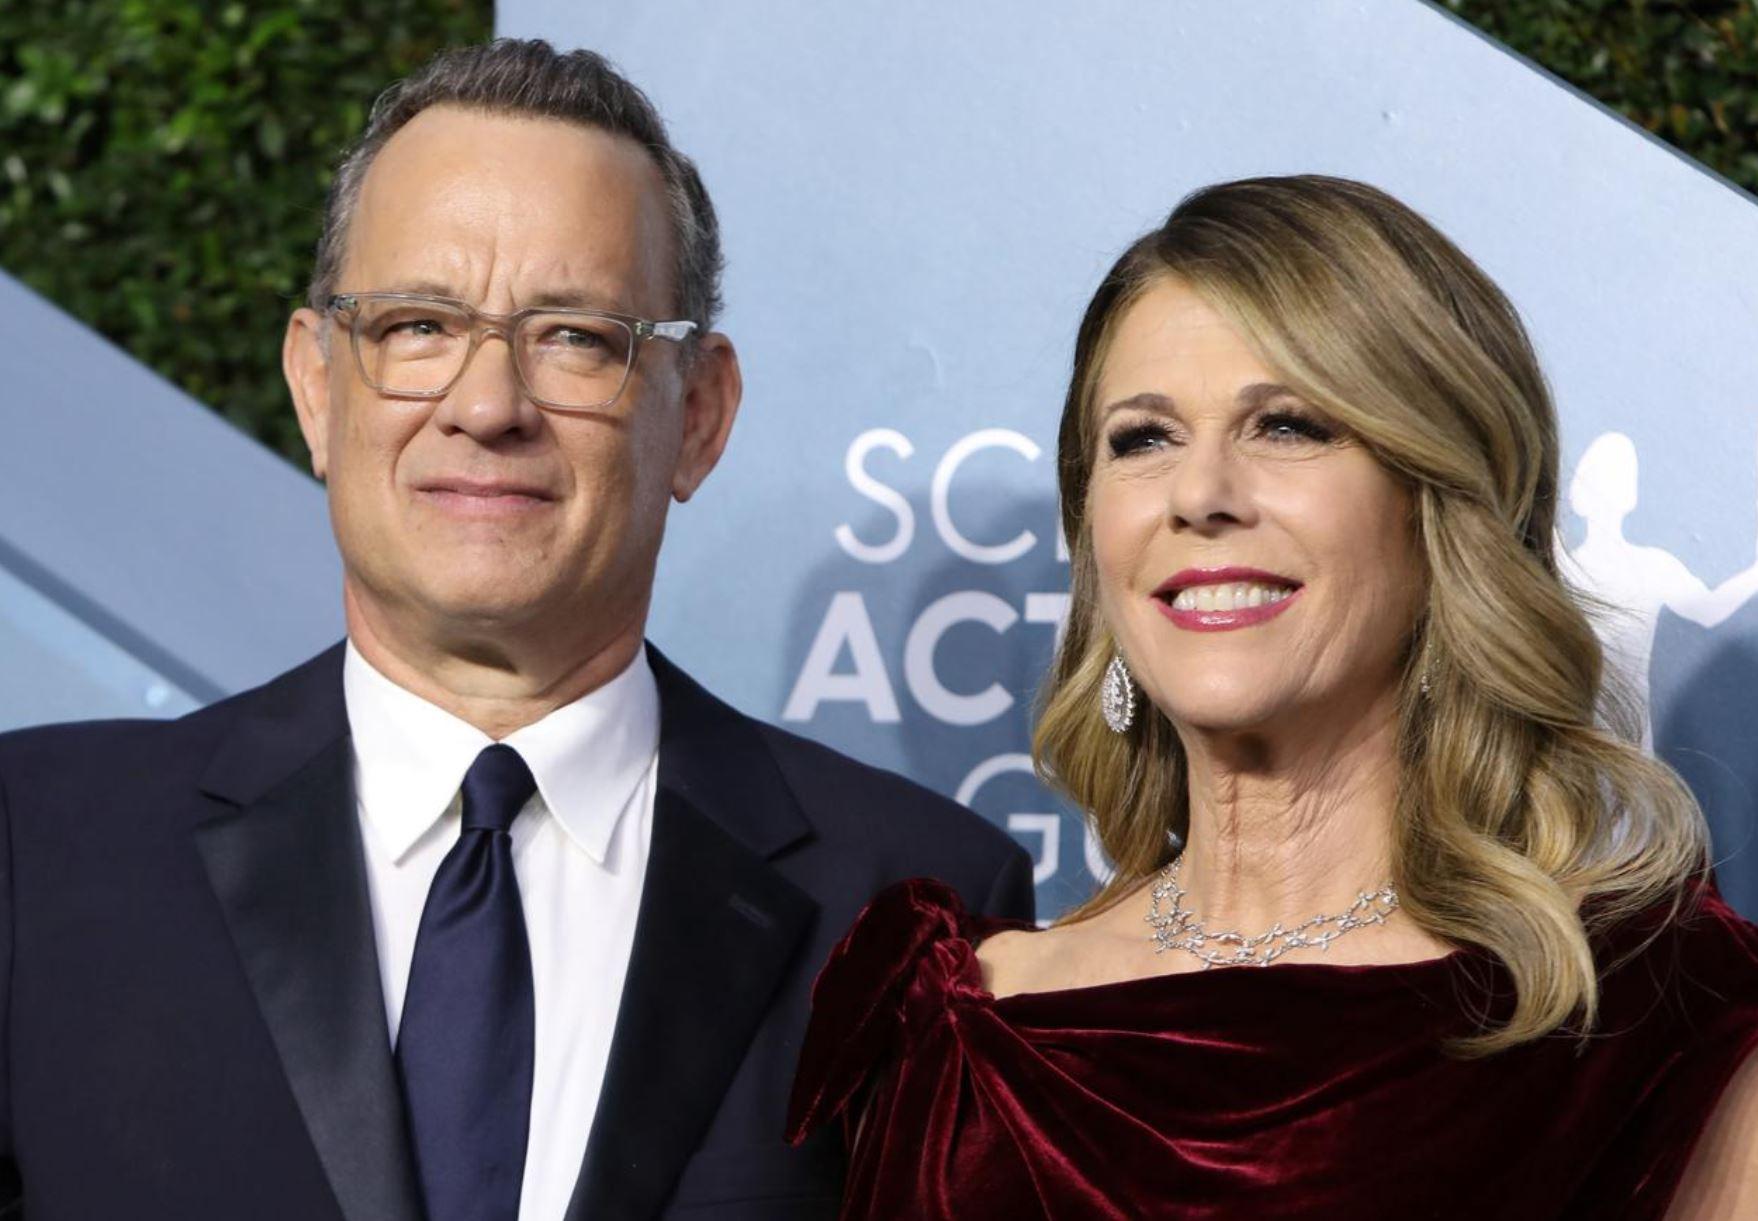 Coronavirus survivor Tom Hanks does not 'have much respect' for people who shun basic precautions